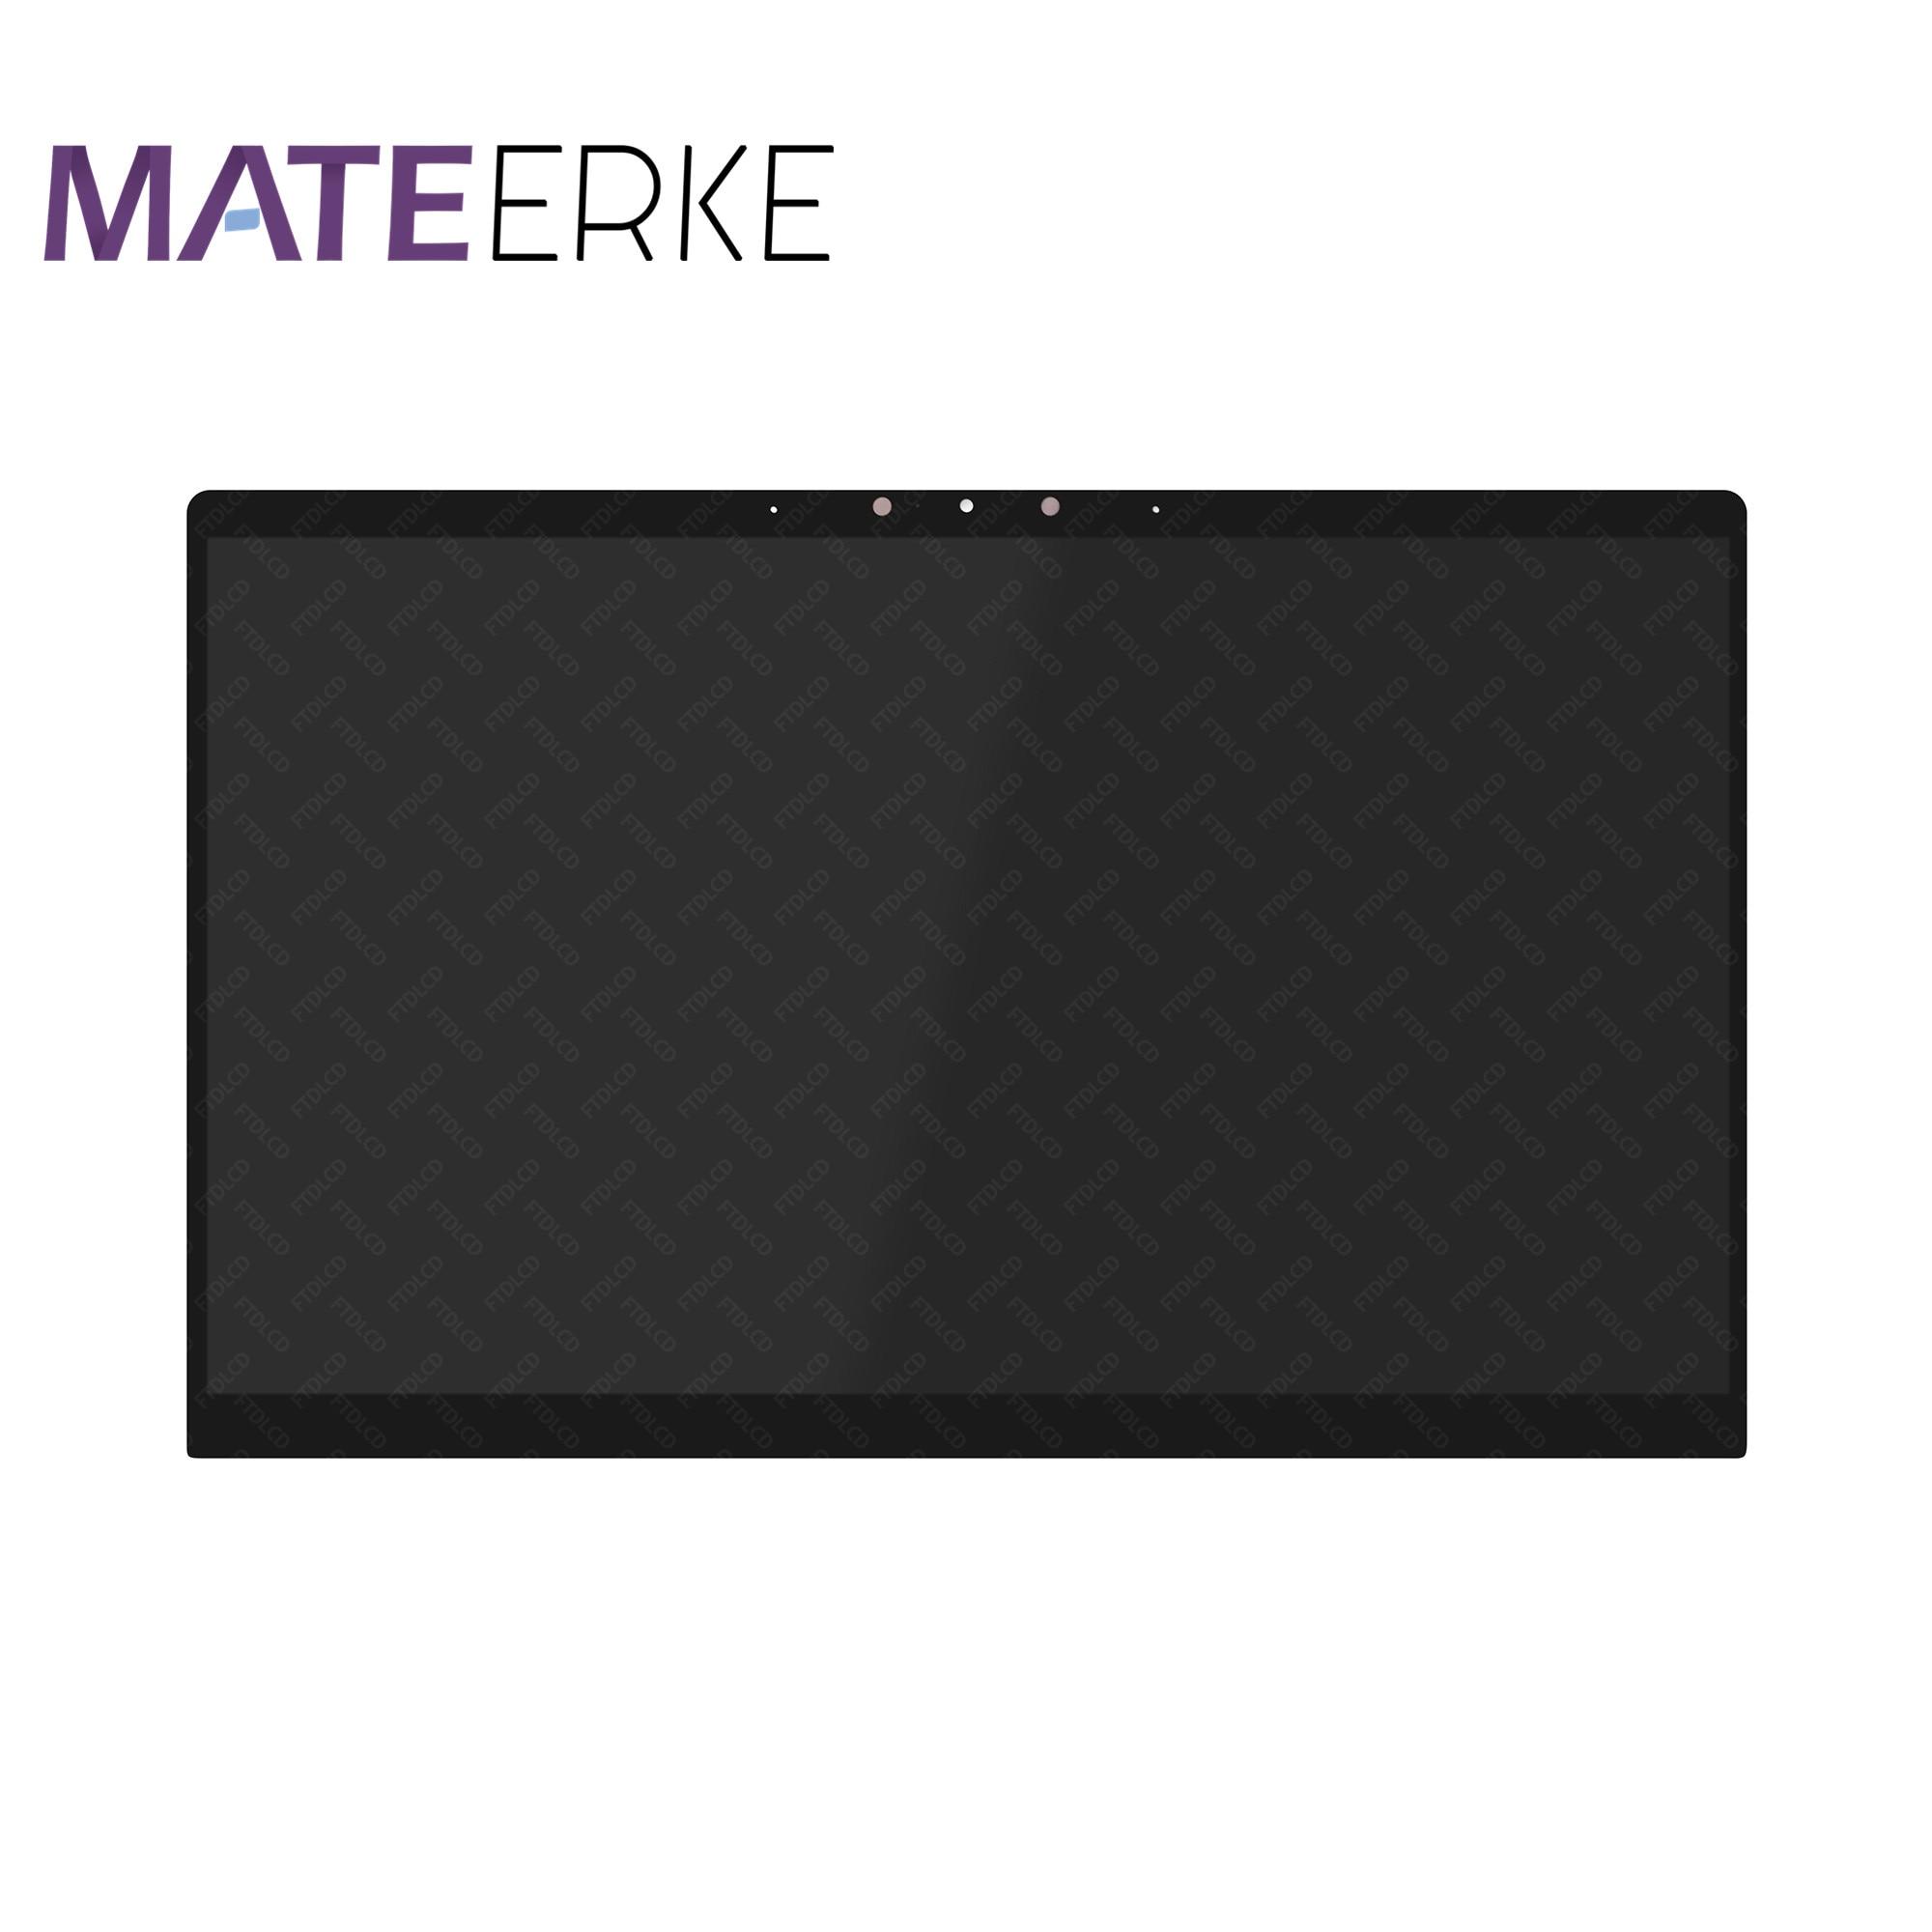 14 ''FHD LCD LED شاشة تعمل باللمس محول الأرقام الجمعية ل ASUS ZenBook الوجه 14 UX463FA-AI039T 1920x1080